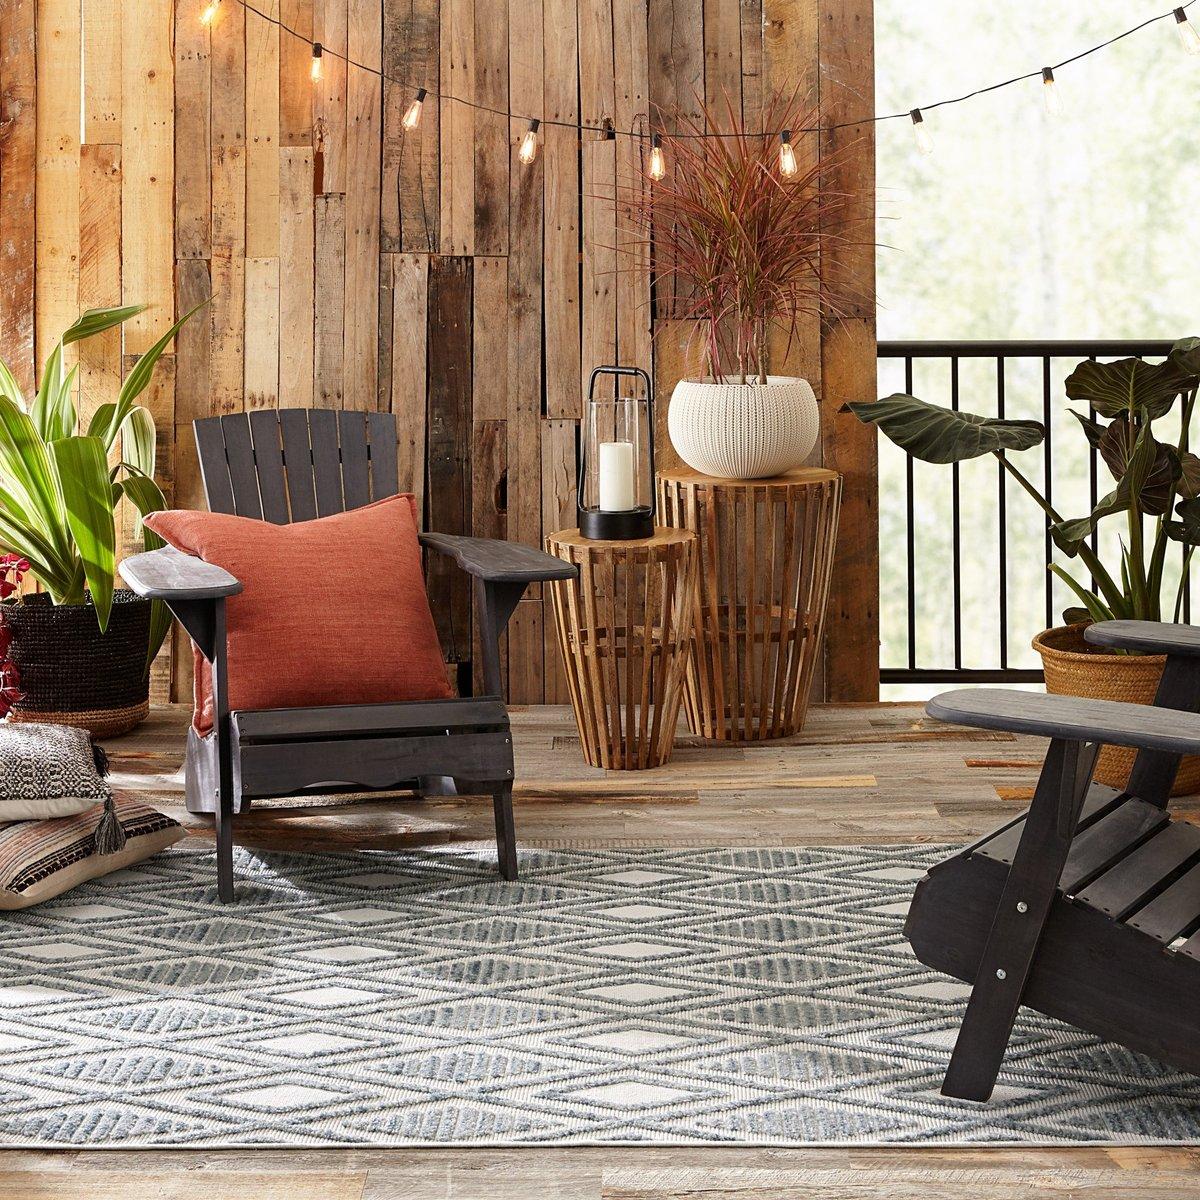 Cozy Ambiance Outdoor Decor Ideas